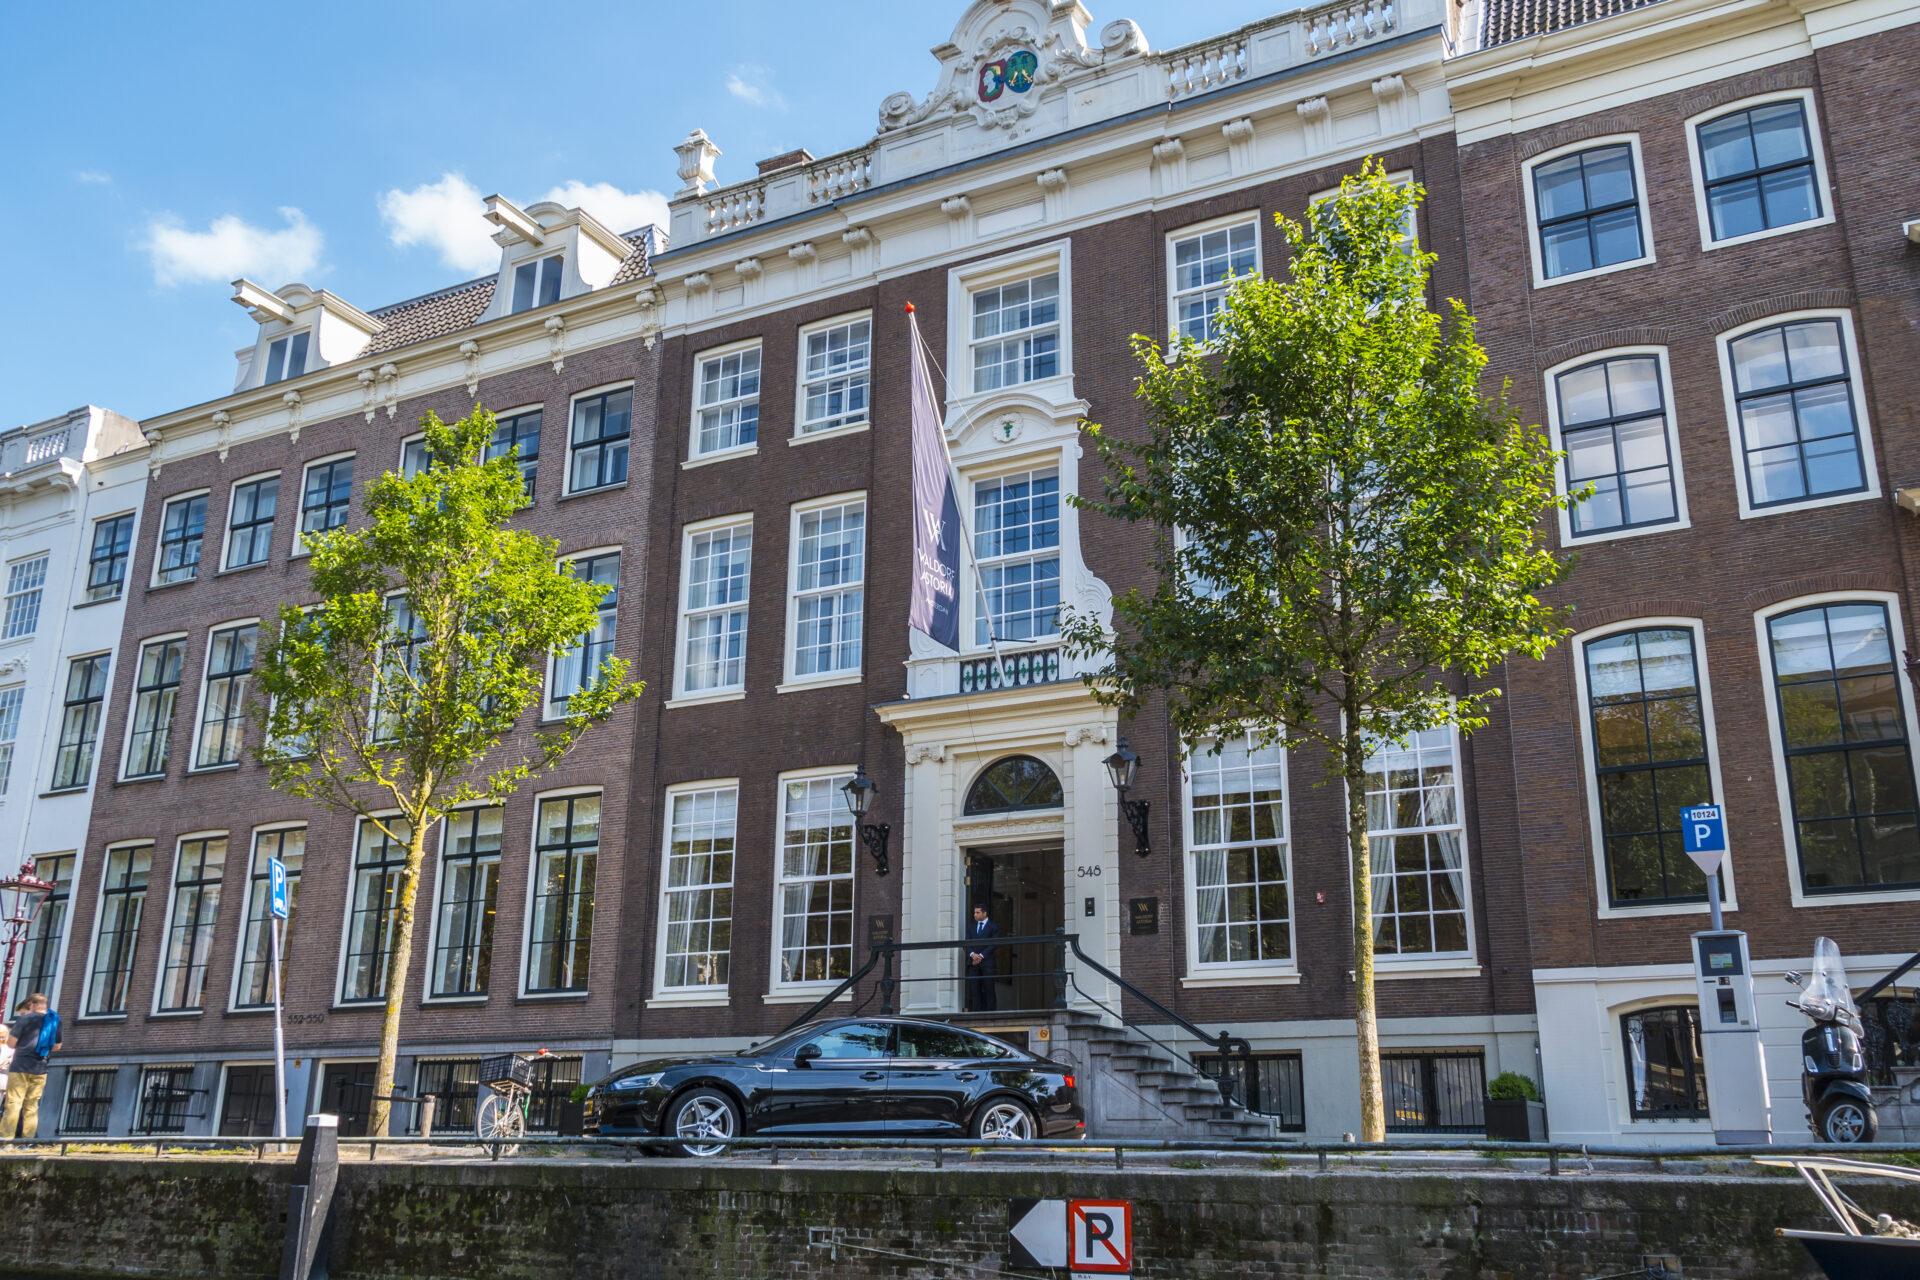 Exclusive Waldorf Astoria Hotel in Amsterdam - AMSTERDAM - THE NETHERLANDS 2017